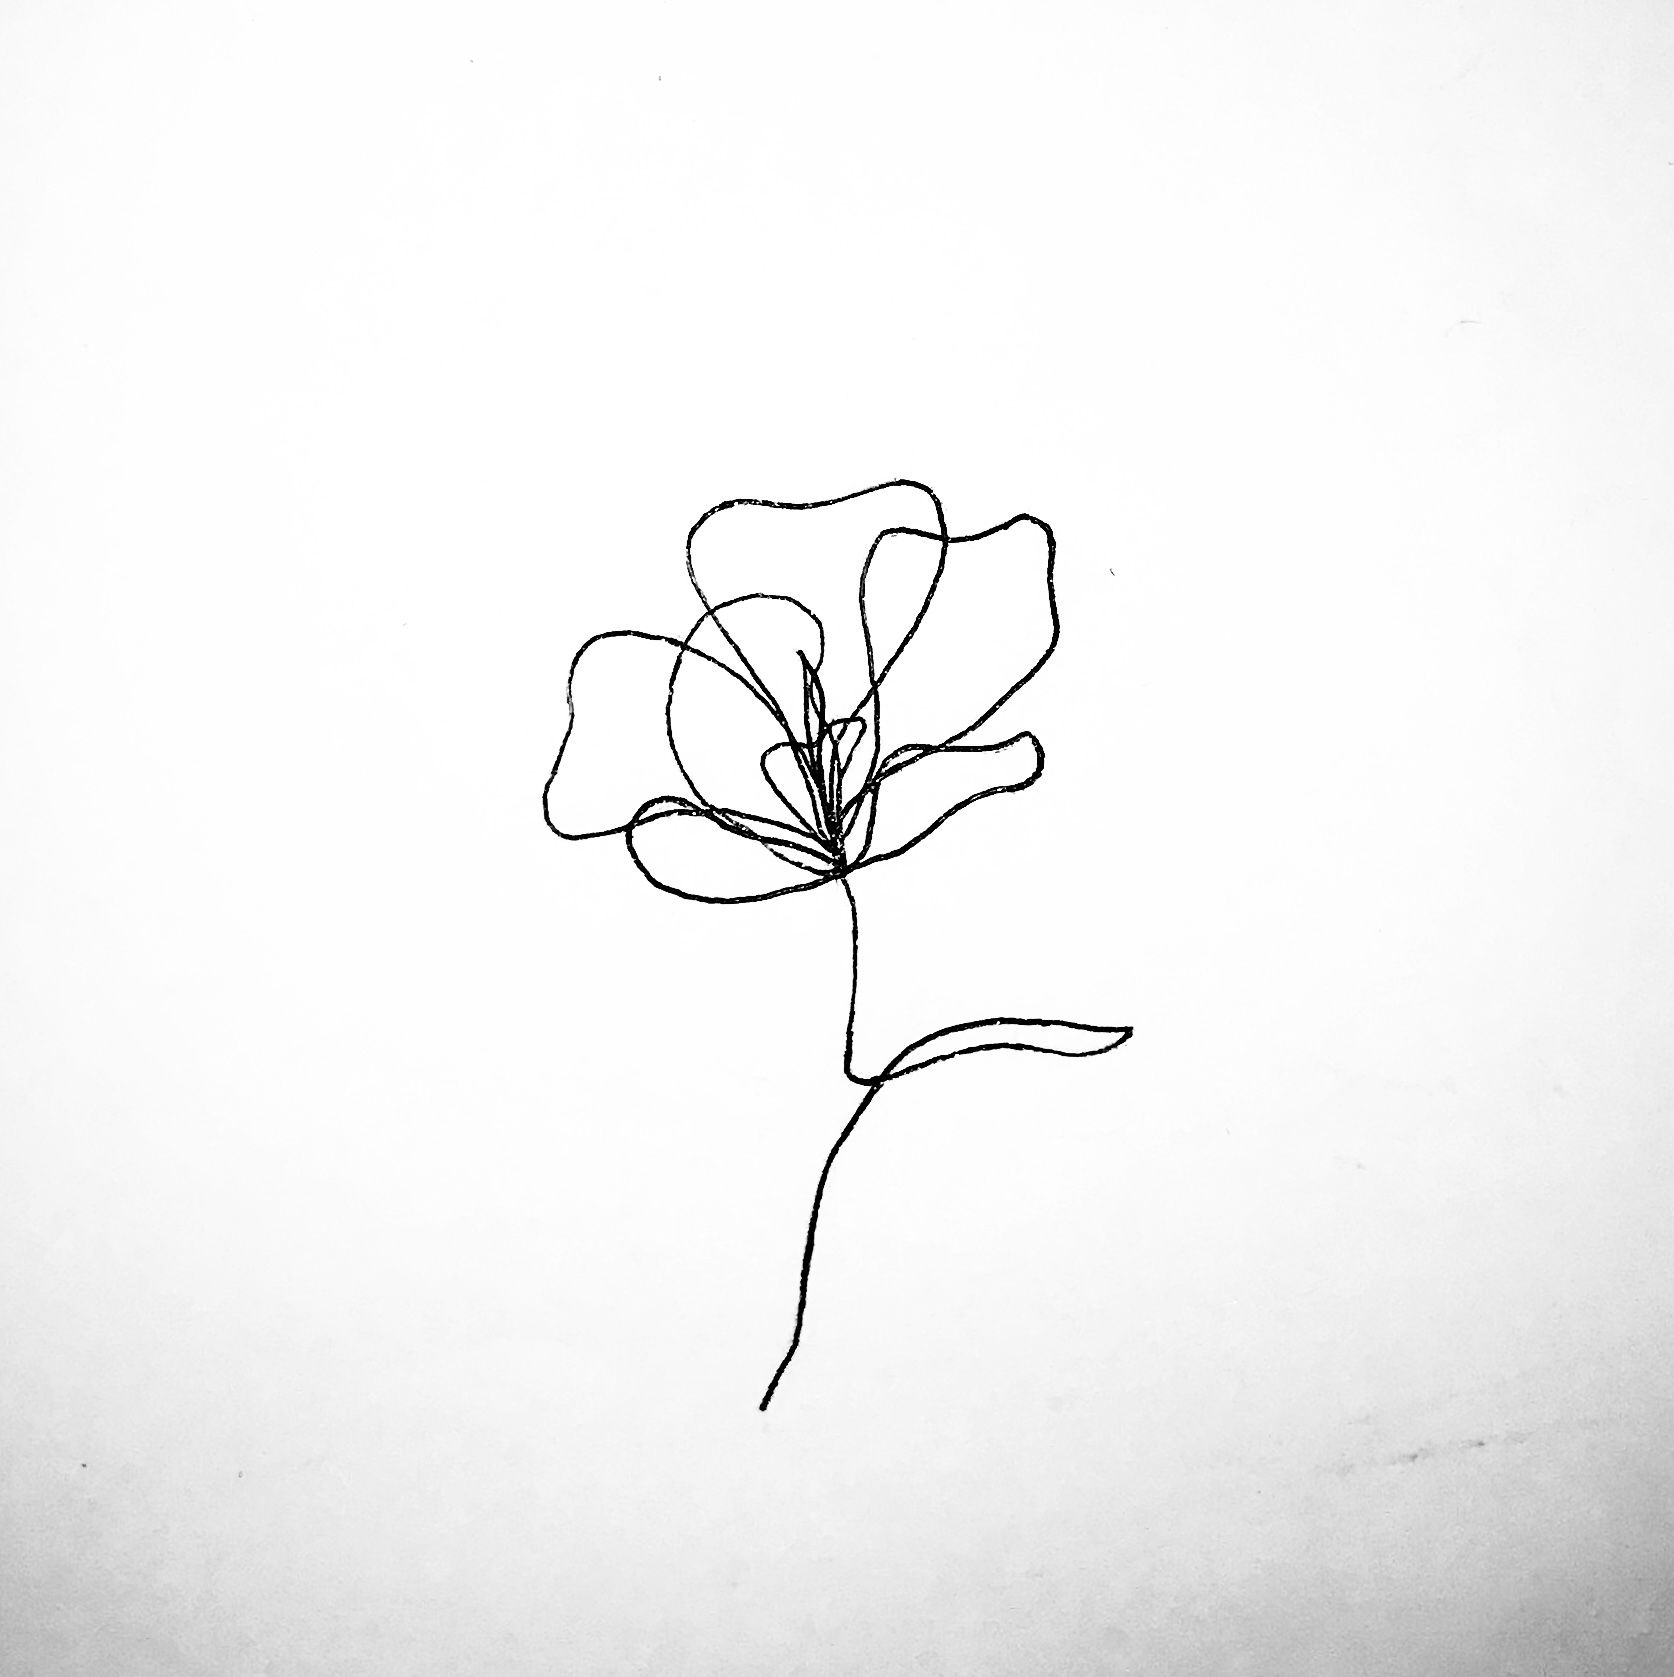 Continuous Line Flower Wiring Diagrams Onan Diagram 6126628 Tattoo Idea Tattoos Pinterest Rh Com Clouds